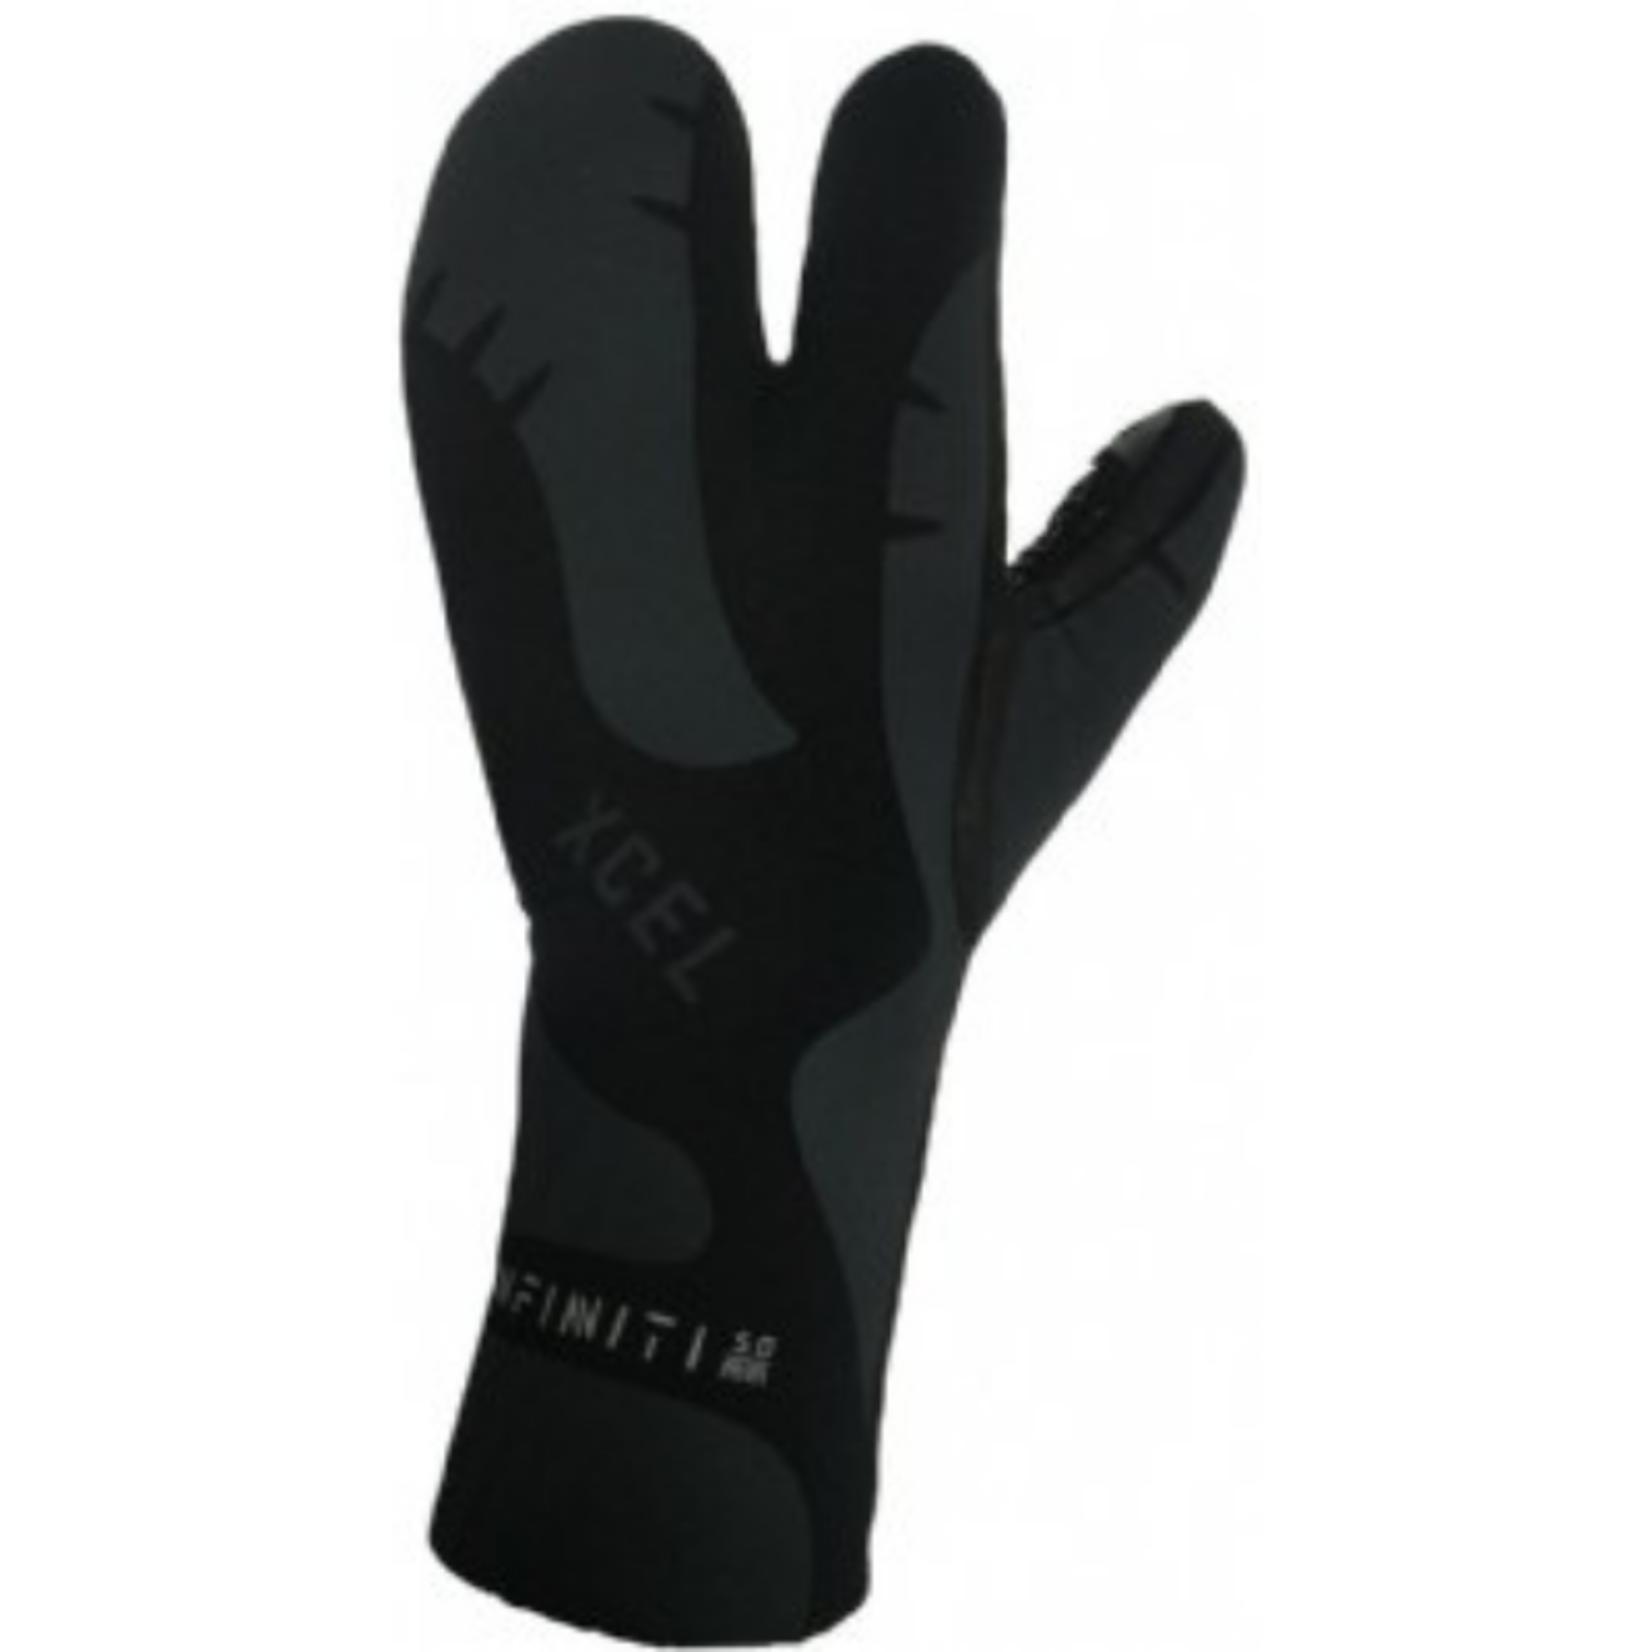 XCEL XCEL Infiniti 3-Finger Glove 5mm Lobster Claw.